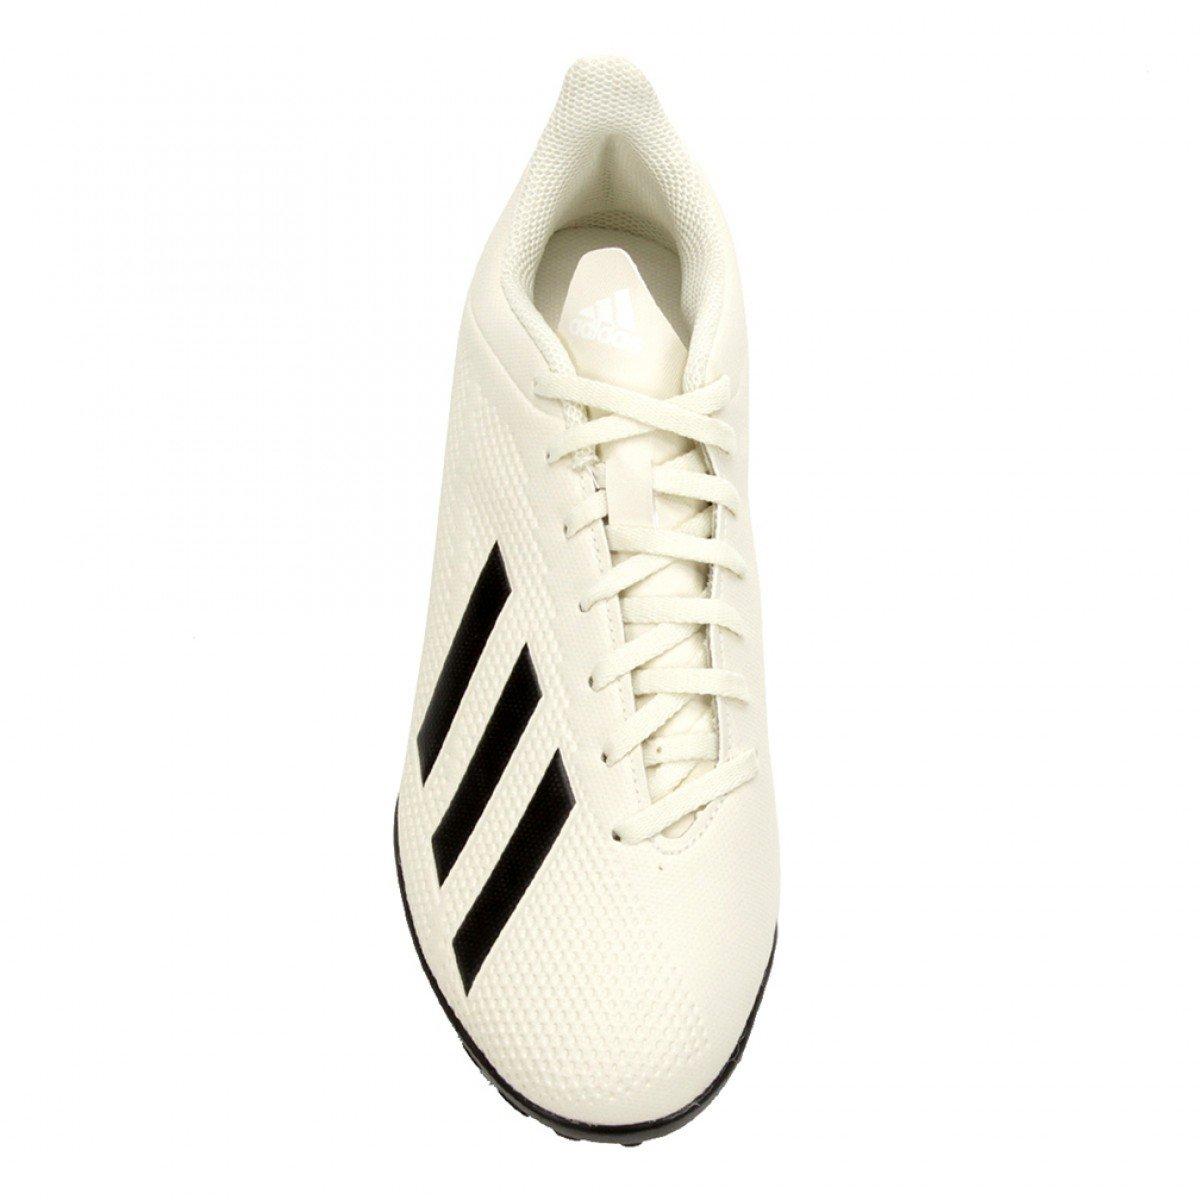 ... Chuteira Society Adidas X Tango 18 4 TF Masculina - Branca e Preta ... 8662cb72dba3b